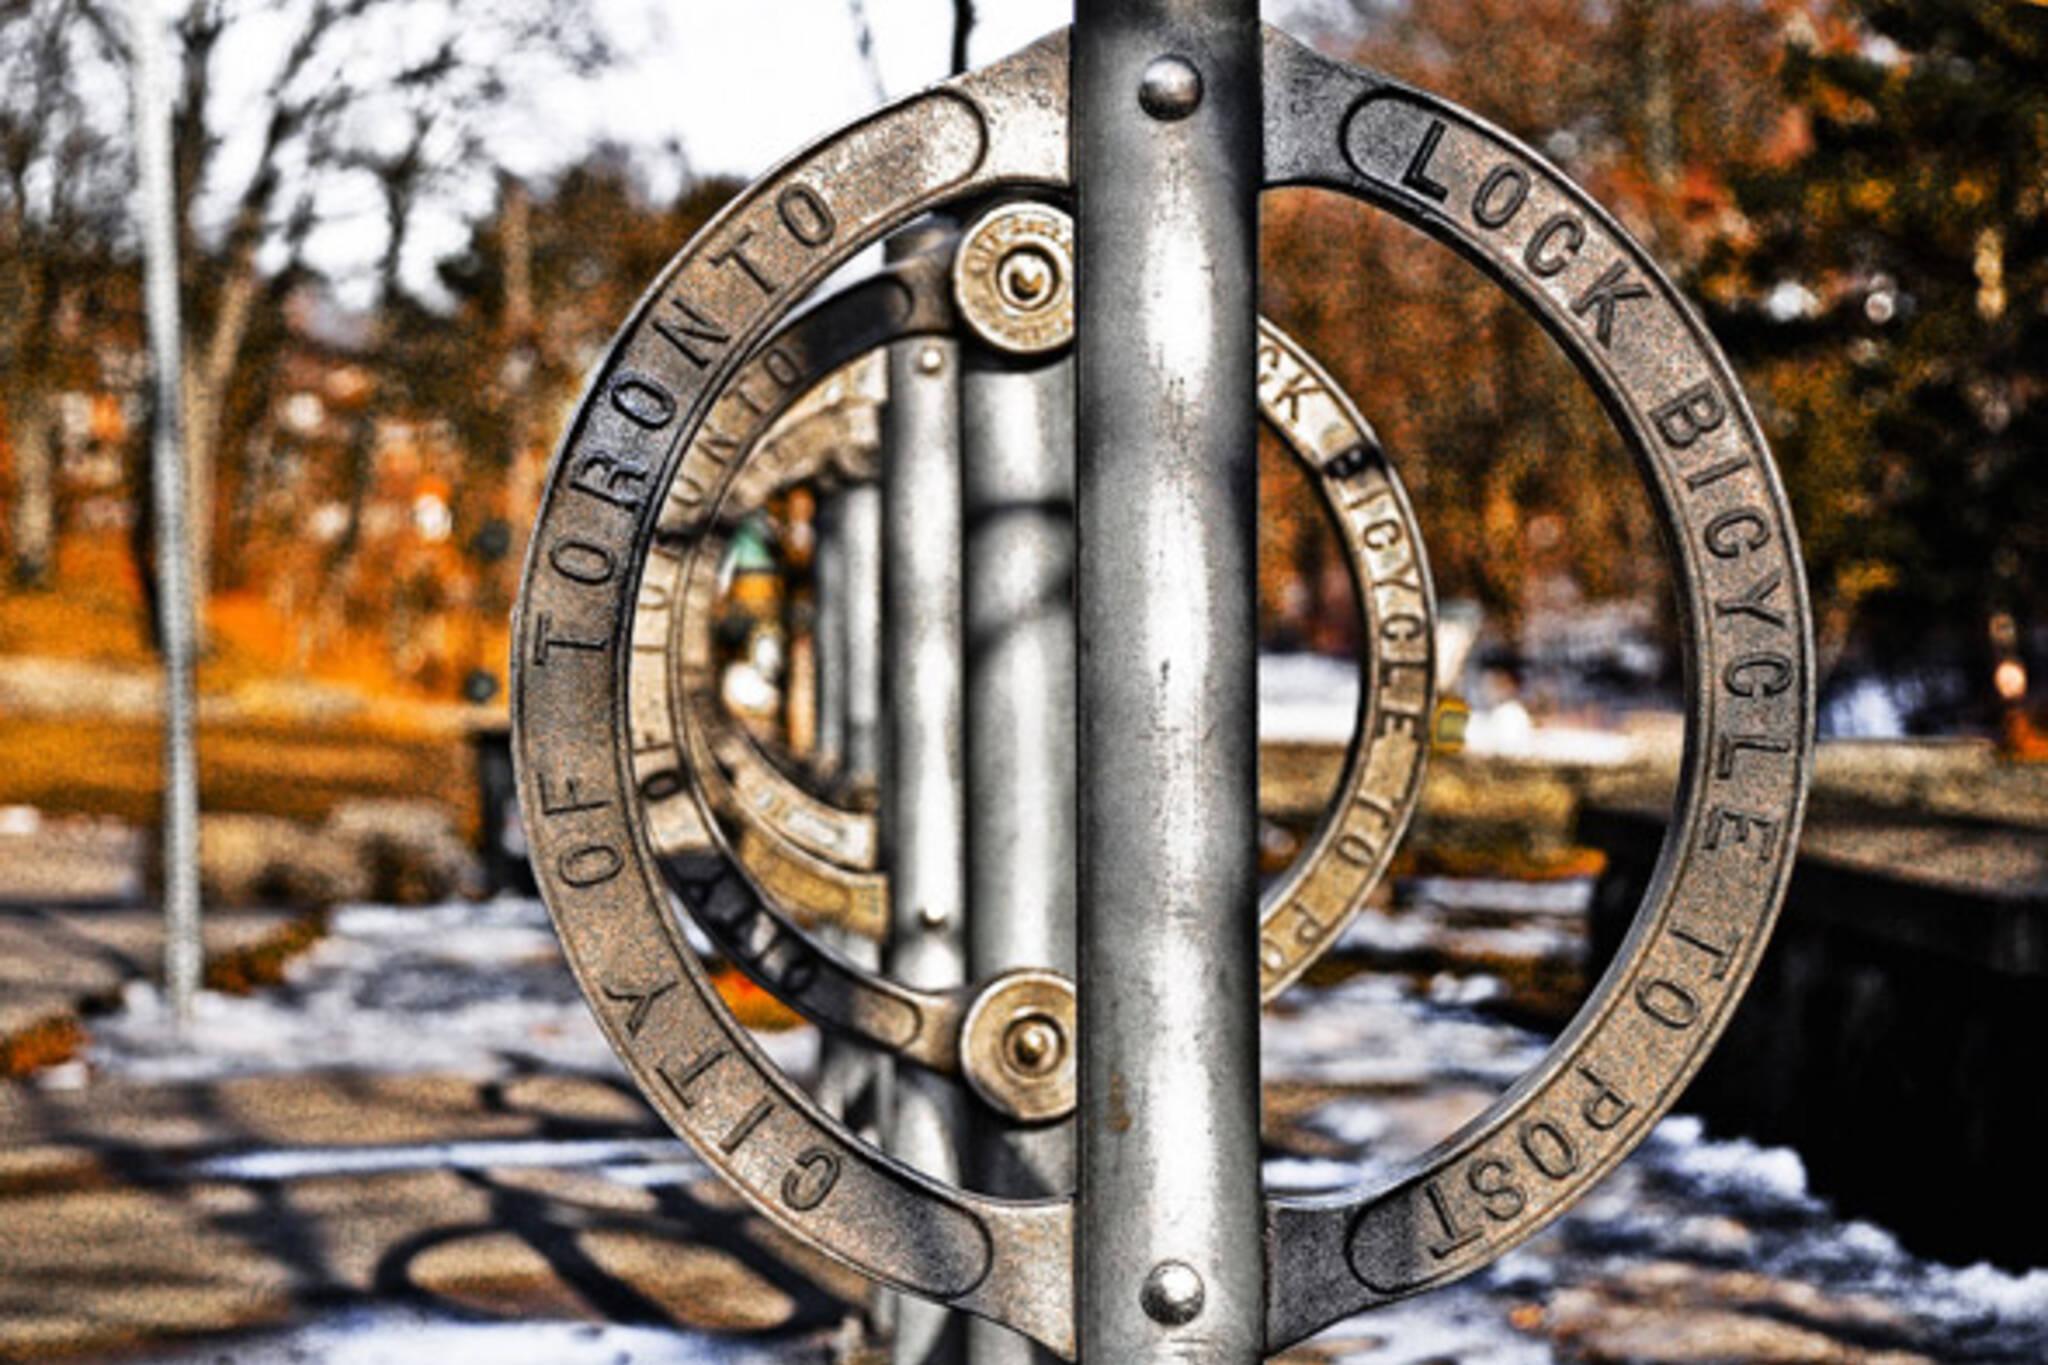 Toronto Bike Lock